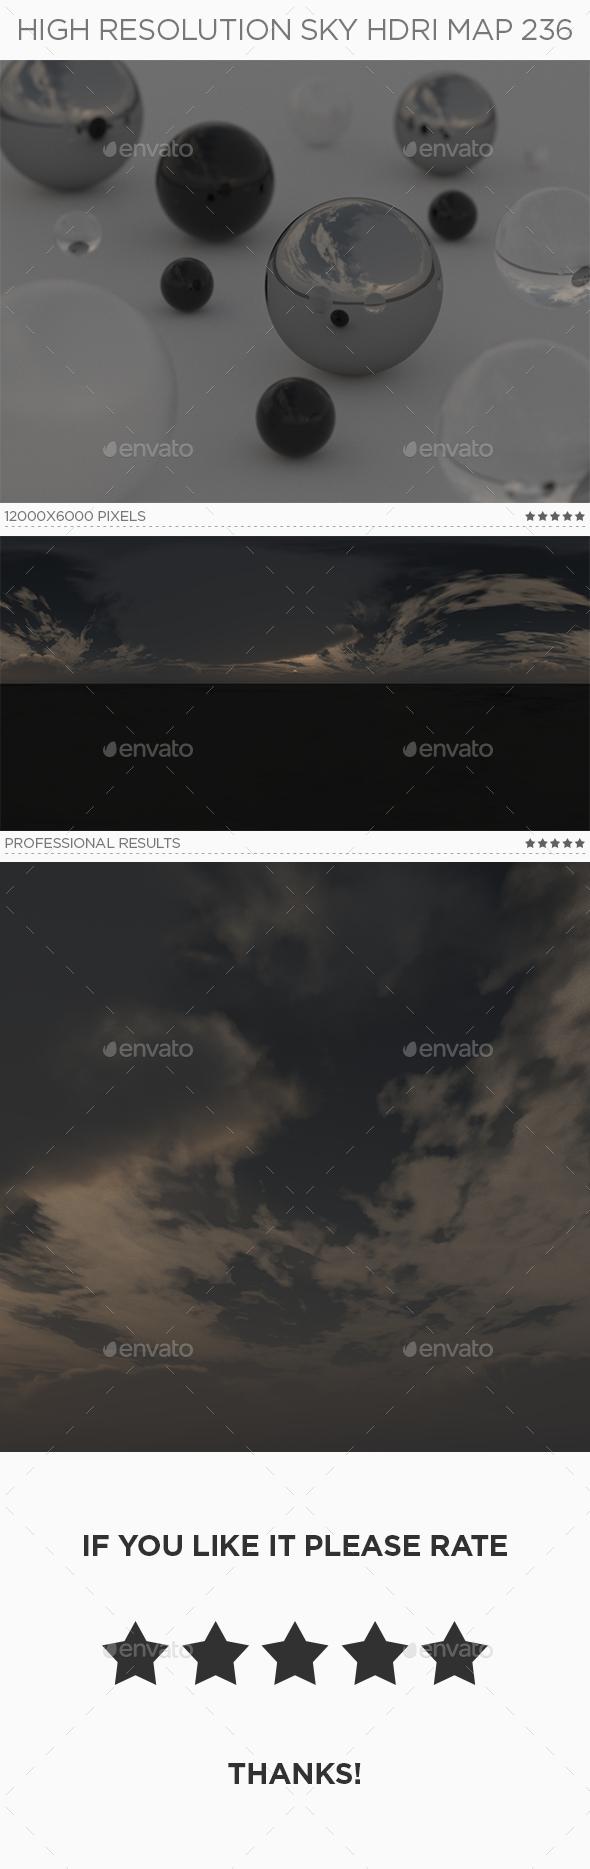 High Resolution Sky HDRi Map 236 - 3DOcean Item for Sale